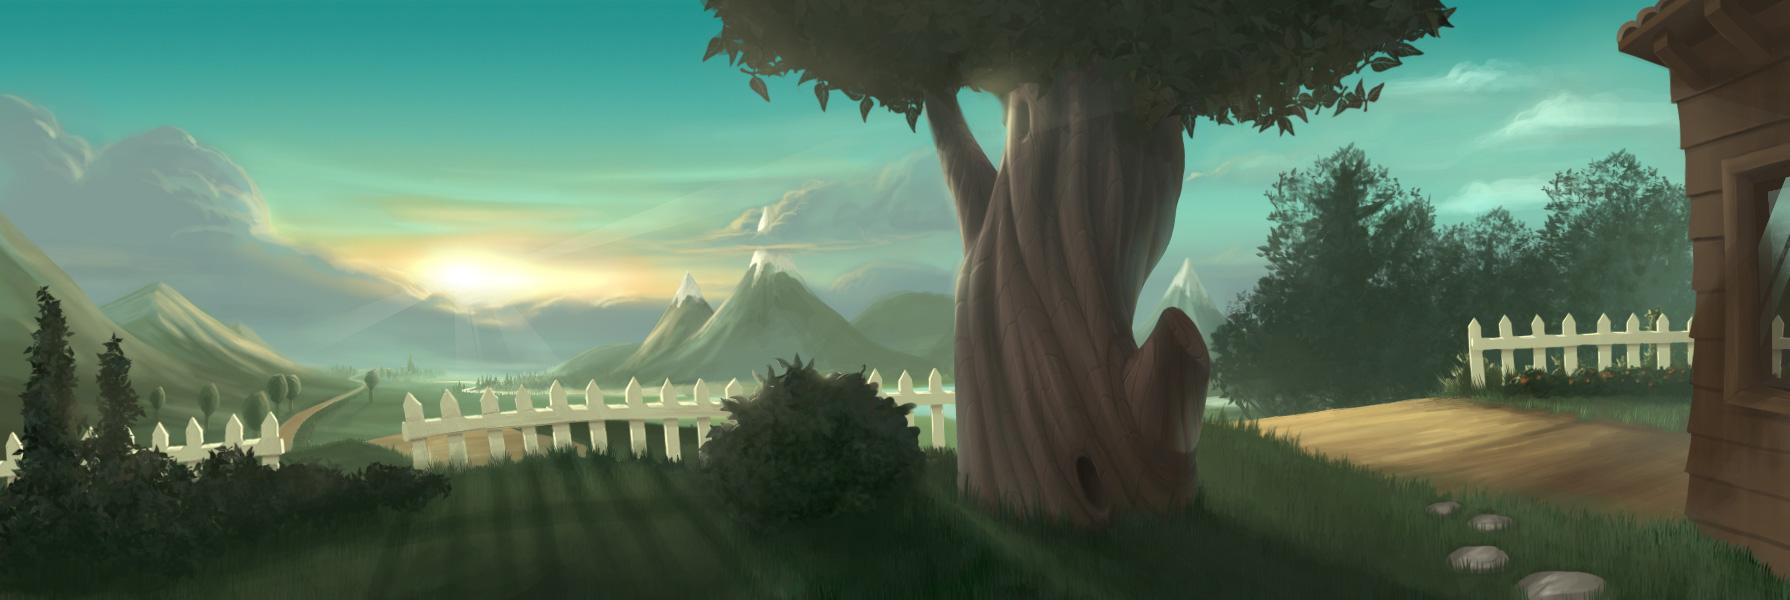 animation background by norke on deviantart